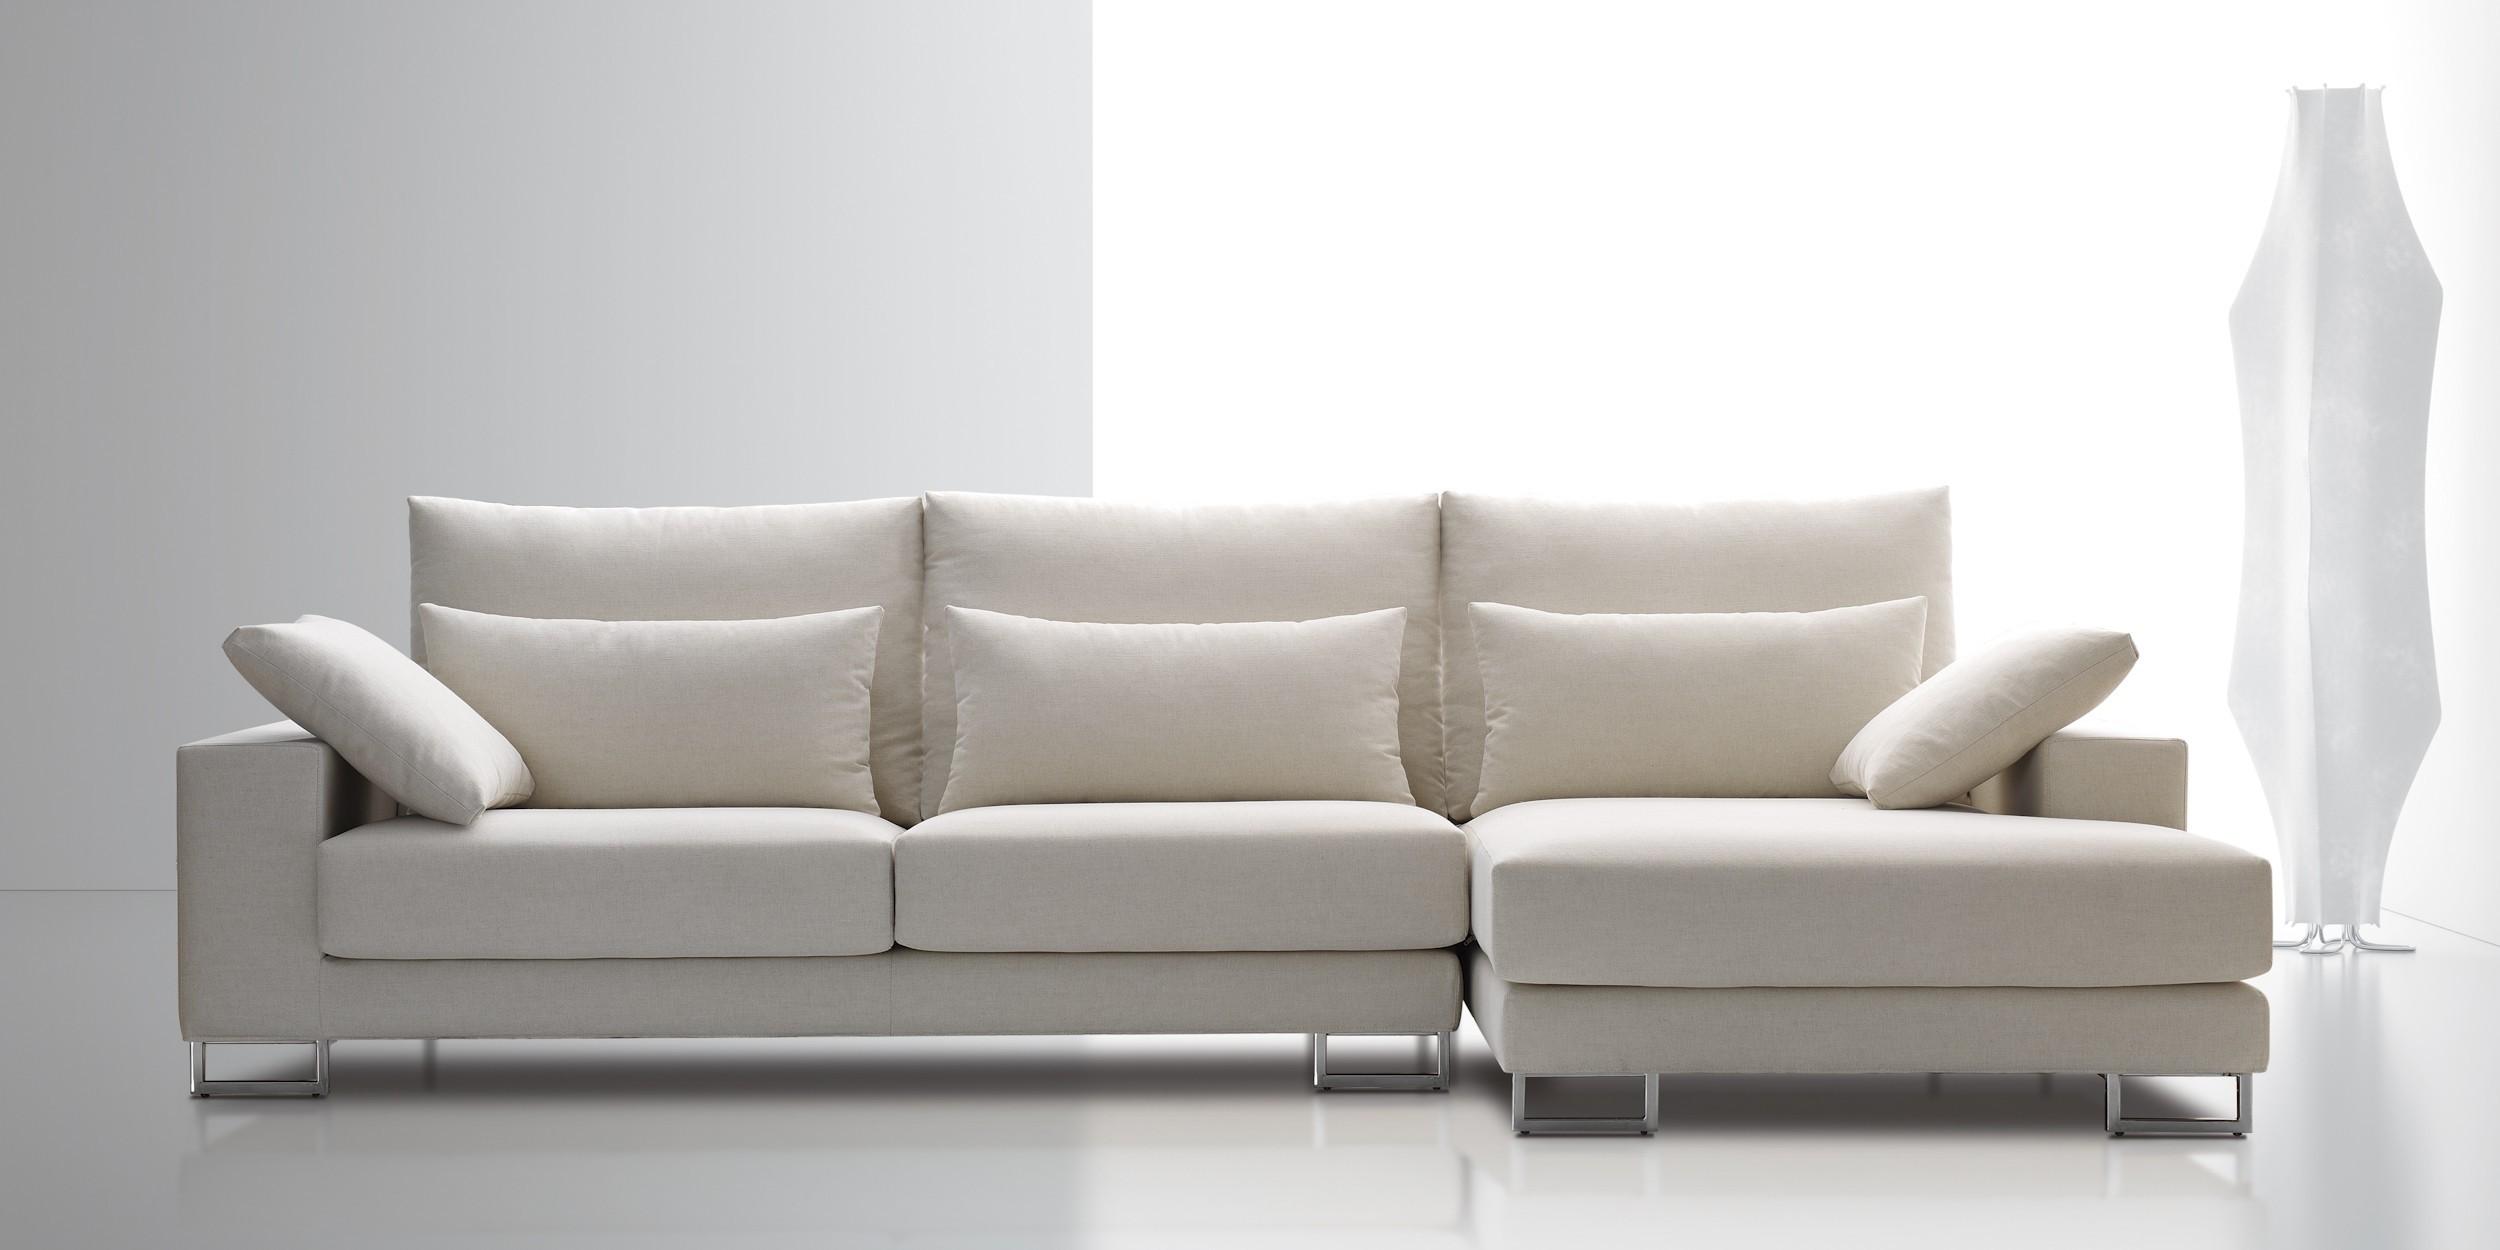 sofa madrid tienda steam cleaning leather tiendas sofas perfect de diseo tela antimanchas